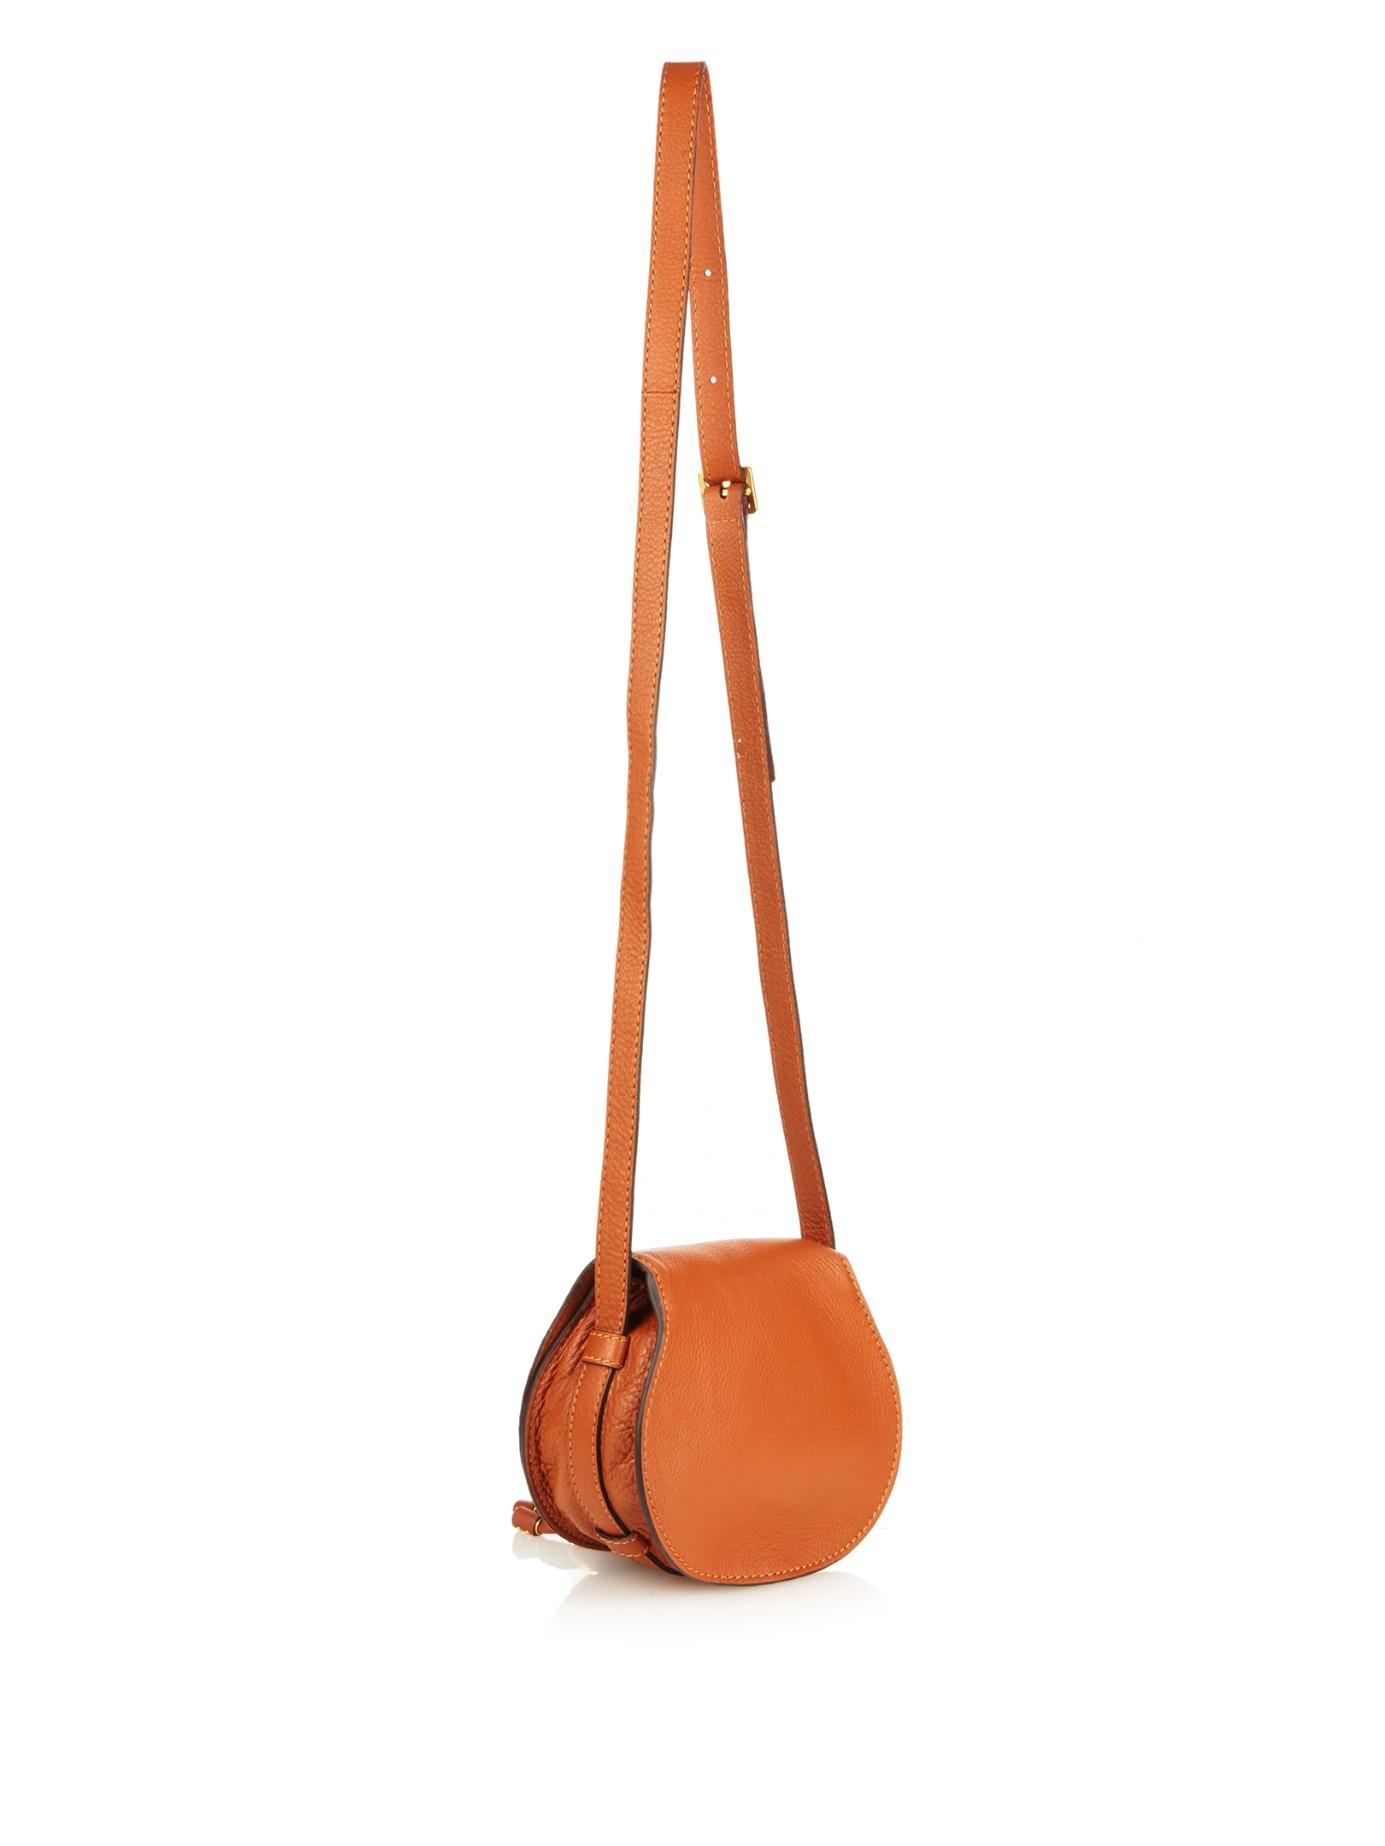 chloe cheap handbags - Chlo�� Marcie Small Leather Cross-Body Bag in Brown (TAN) | Lyst